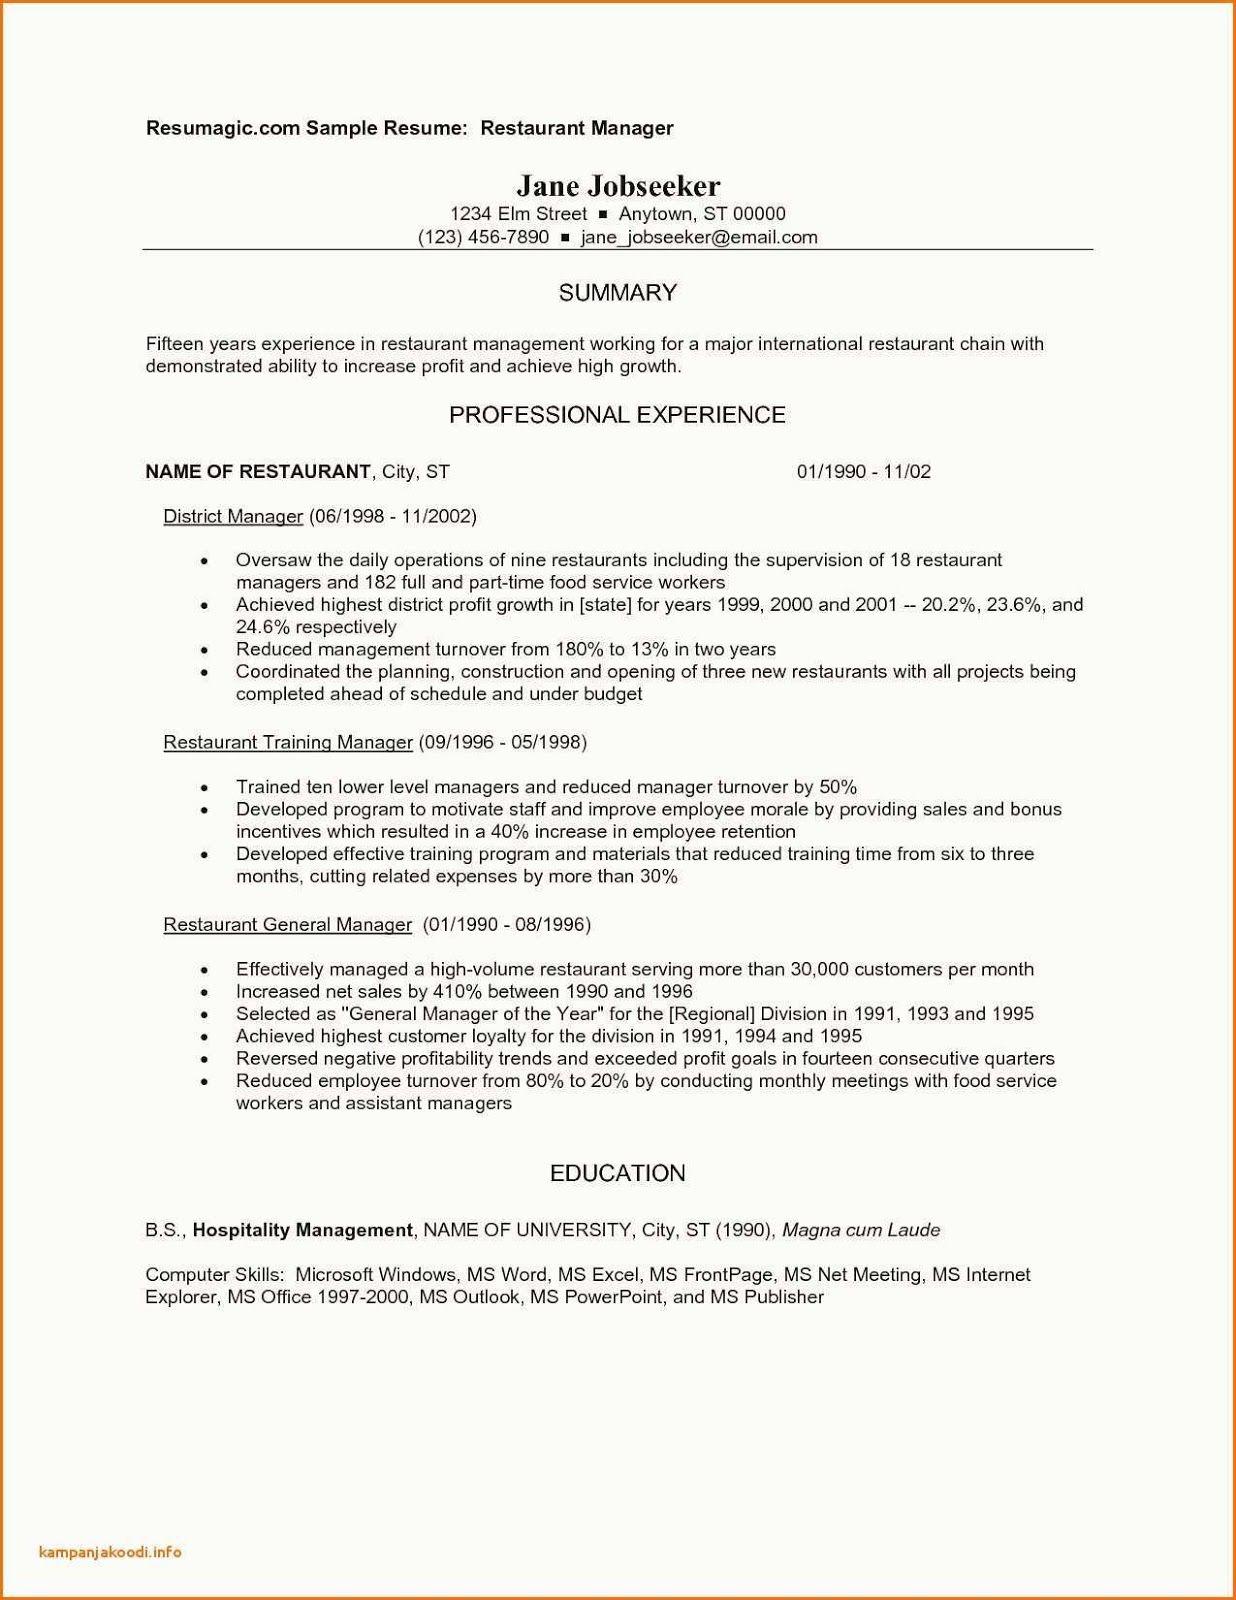 Academic resume sample, academic resume sample pdf